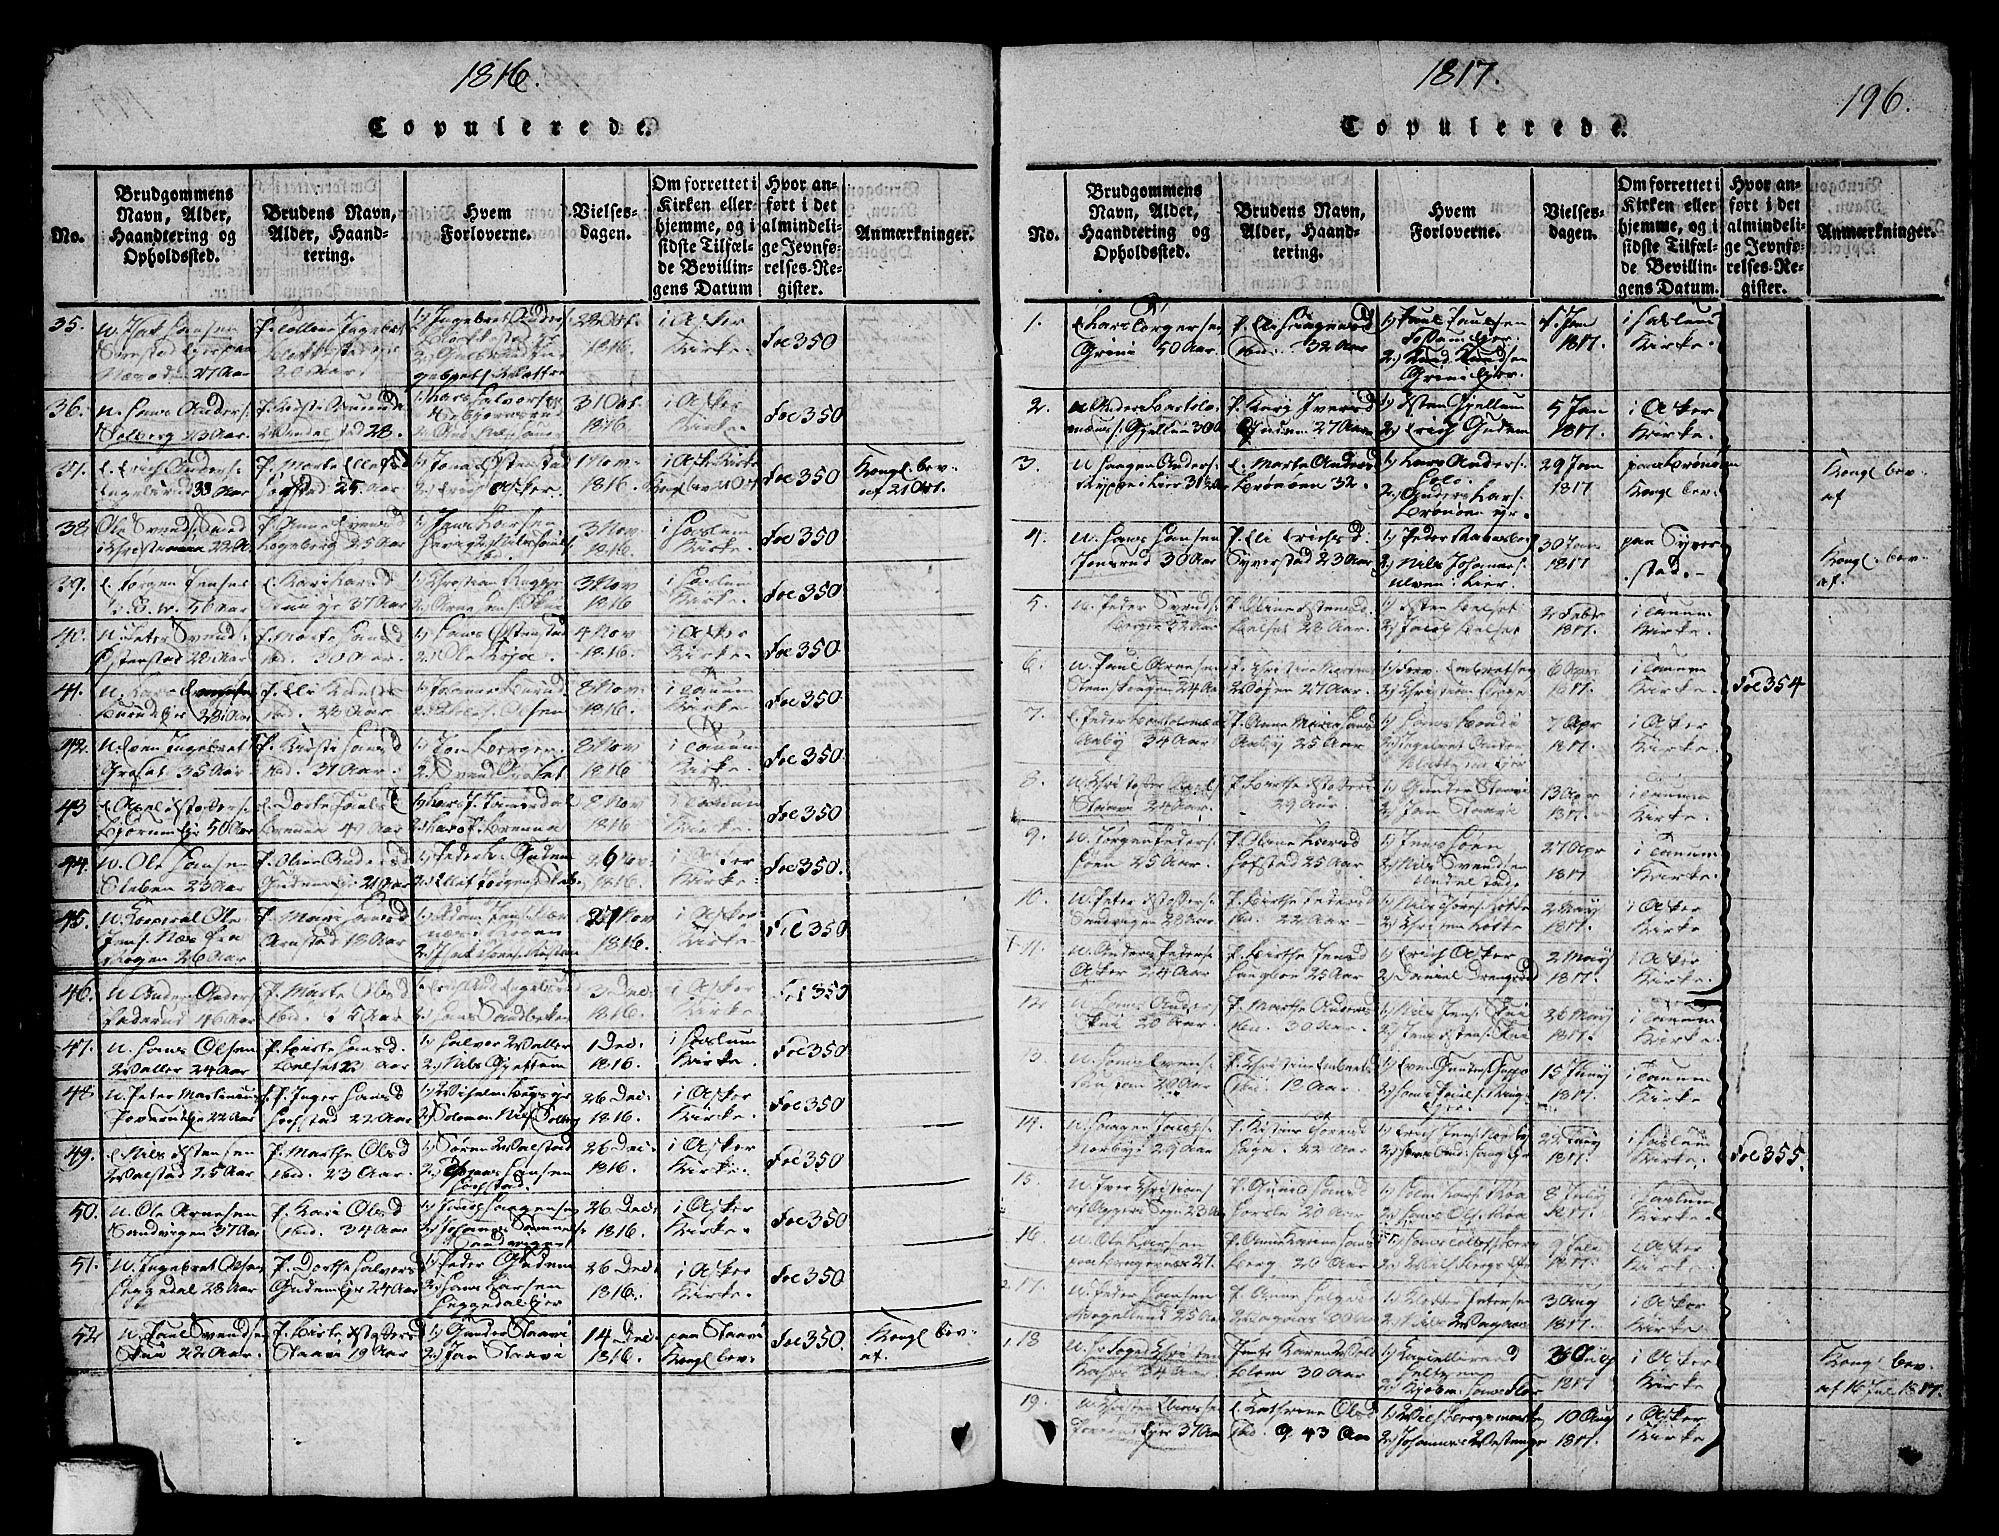 SAO, Asker prestekontor Kirkebøker, G/Ga/L0001: Klokkerbok nr. I 1, 1814-1830, s. 196